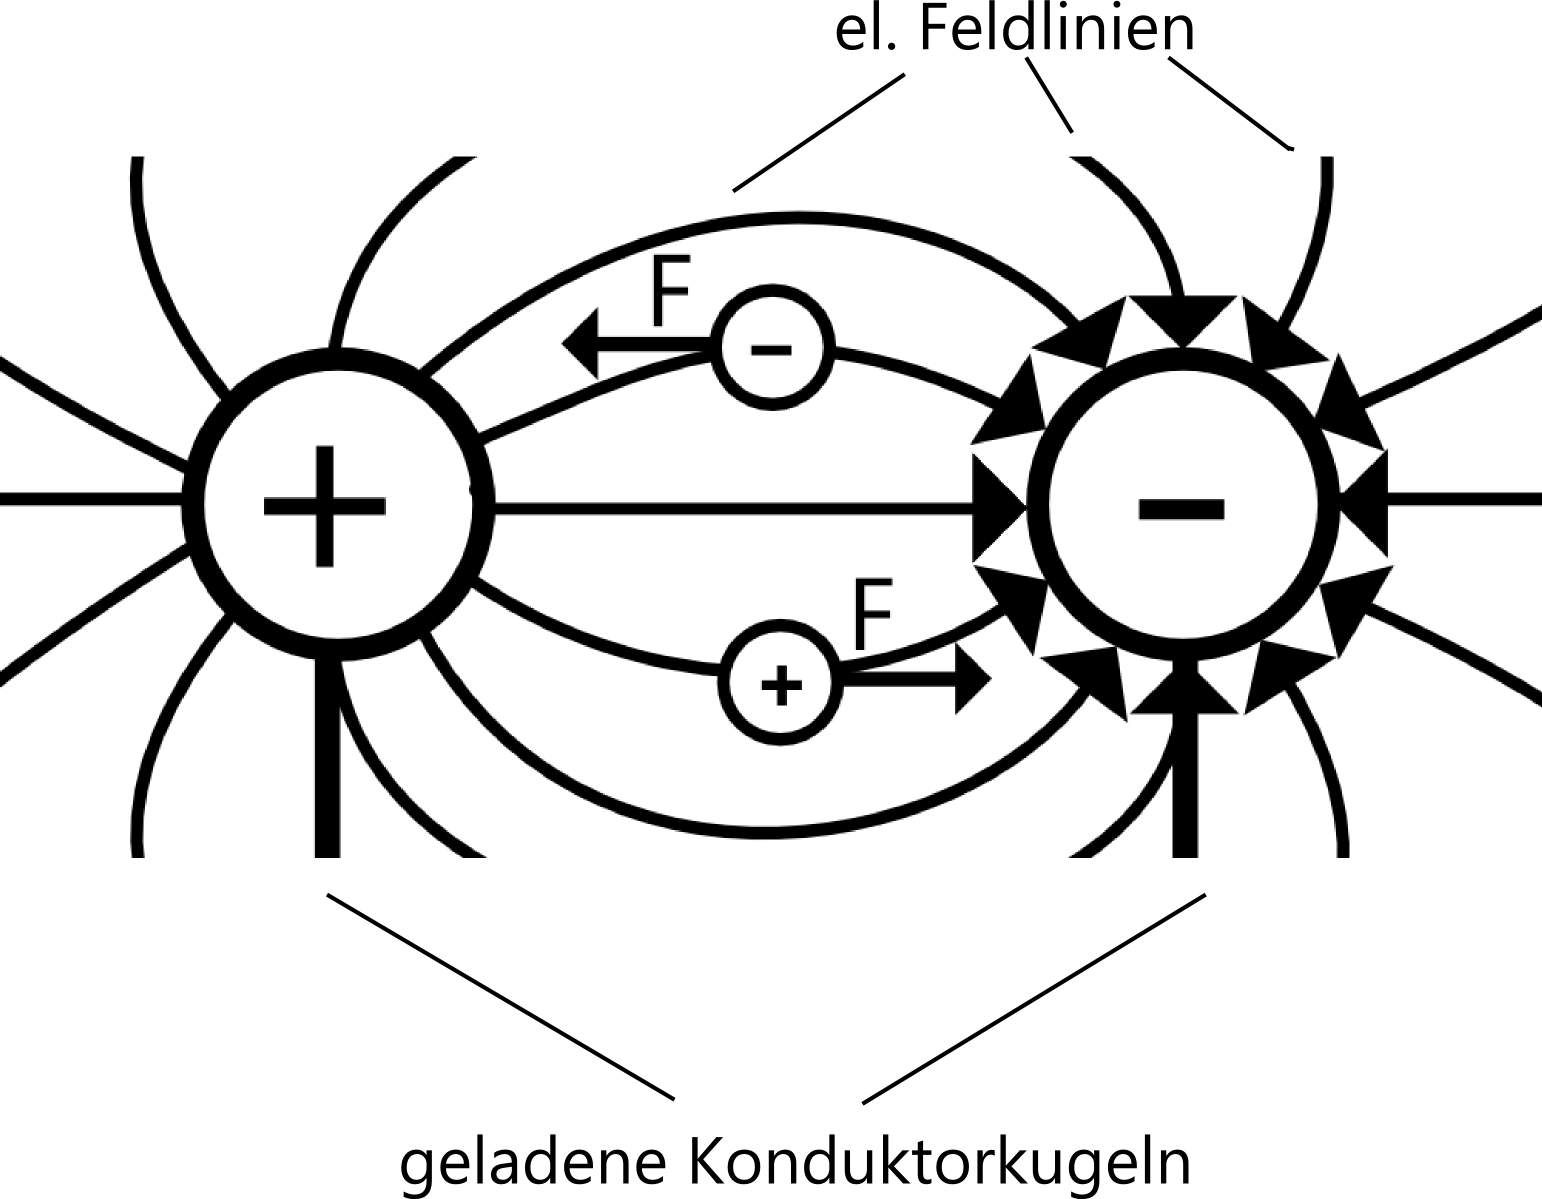 SDL-SERVER PhysikSkript/Homogene elektrische Felder und der ...